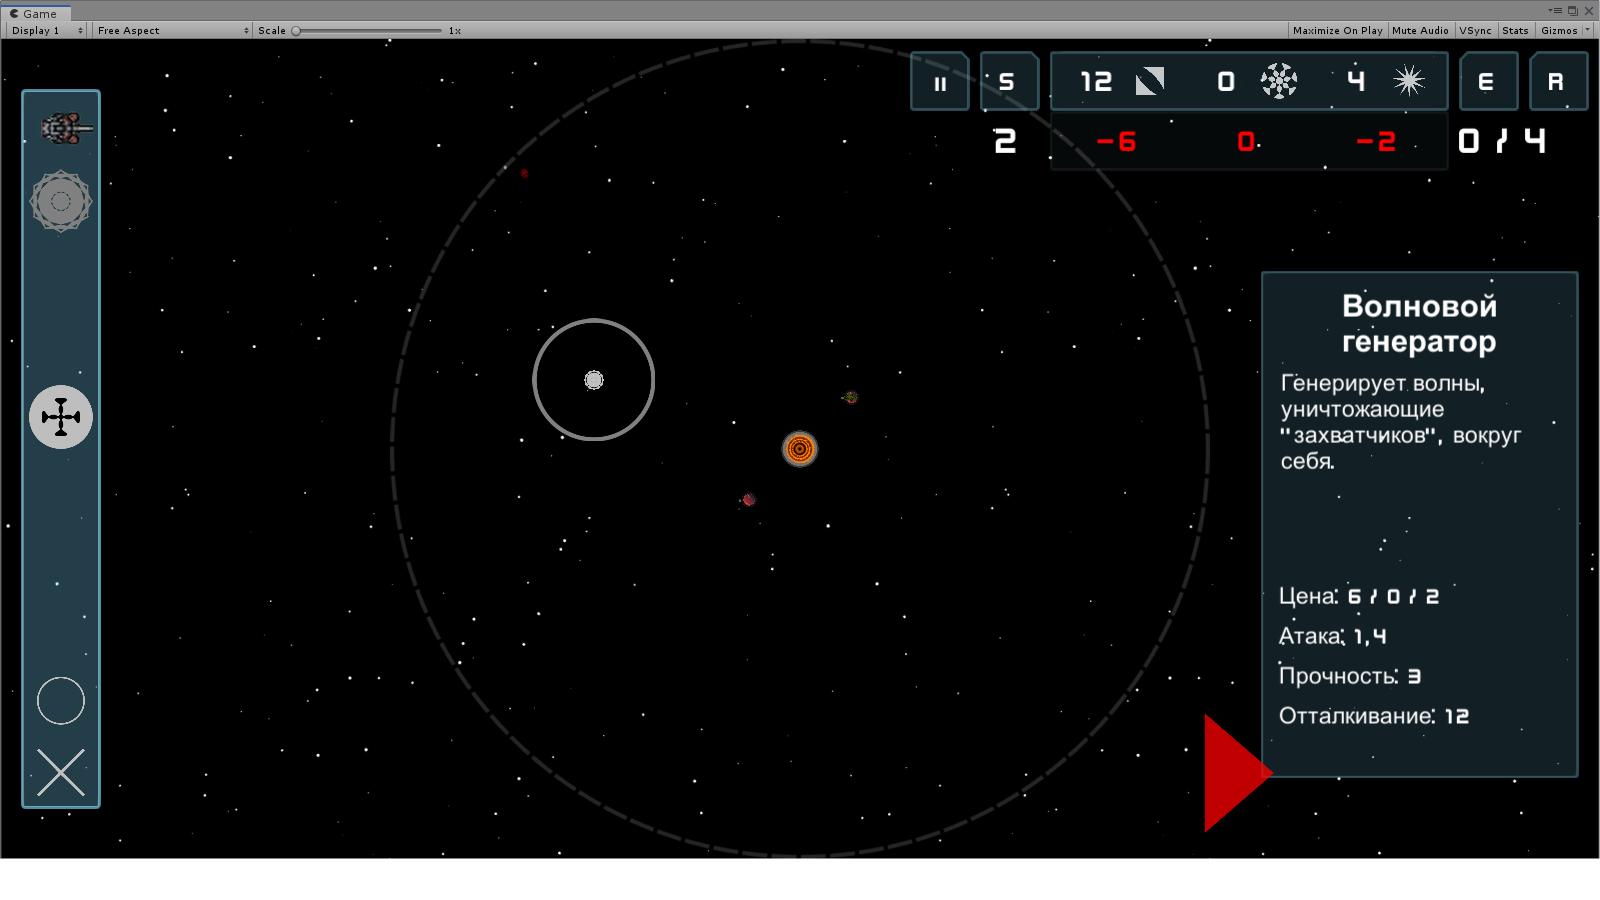 3_1   Black Hole Defense (Tower Defense)